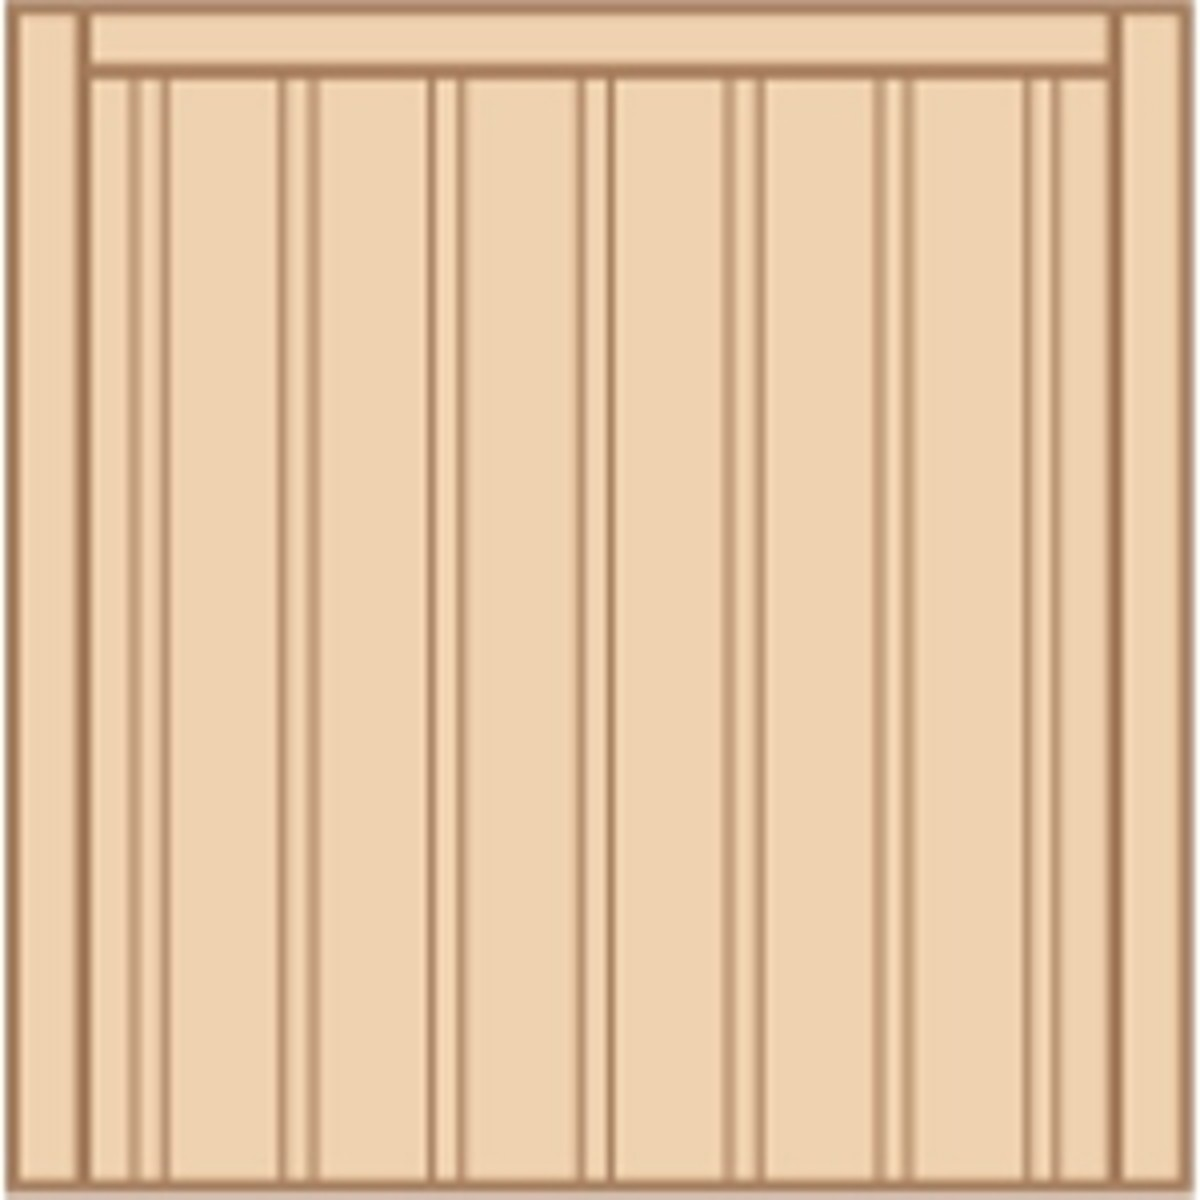 Wooden gates - Single wooden gates - Dalby gate